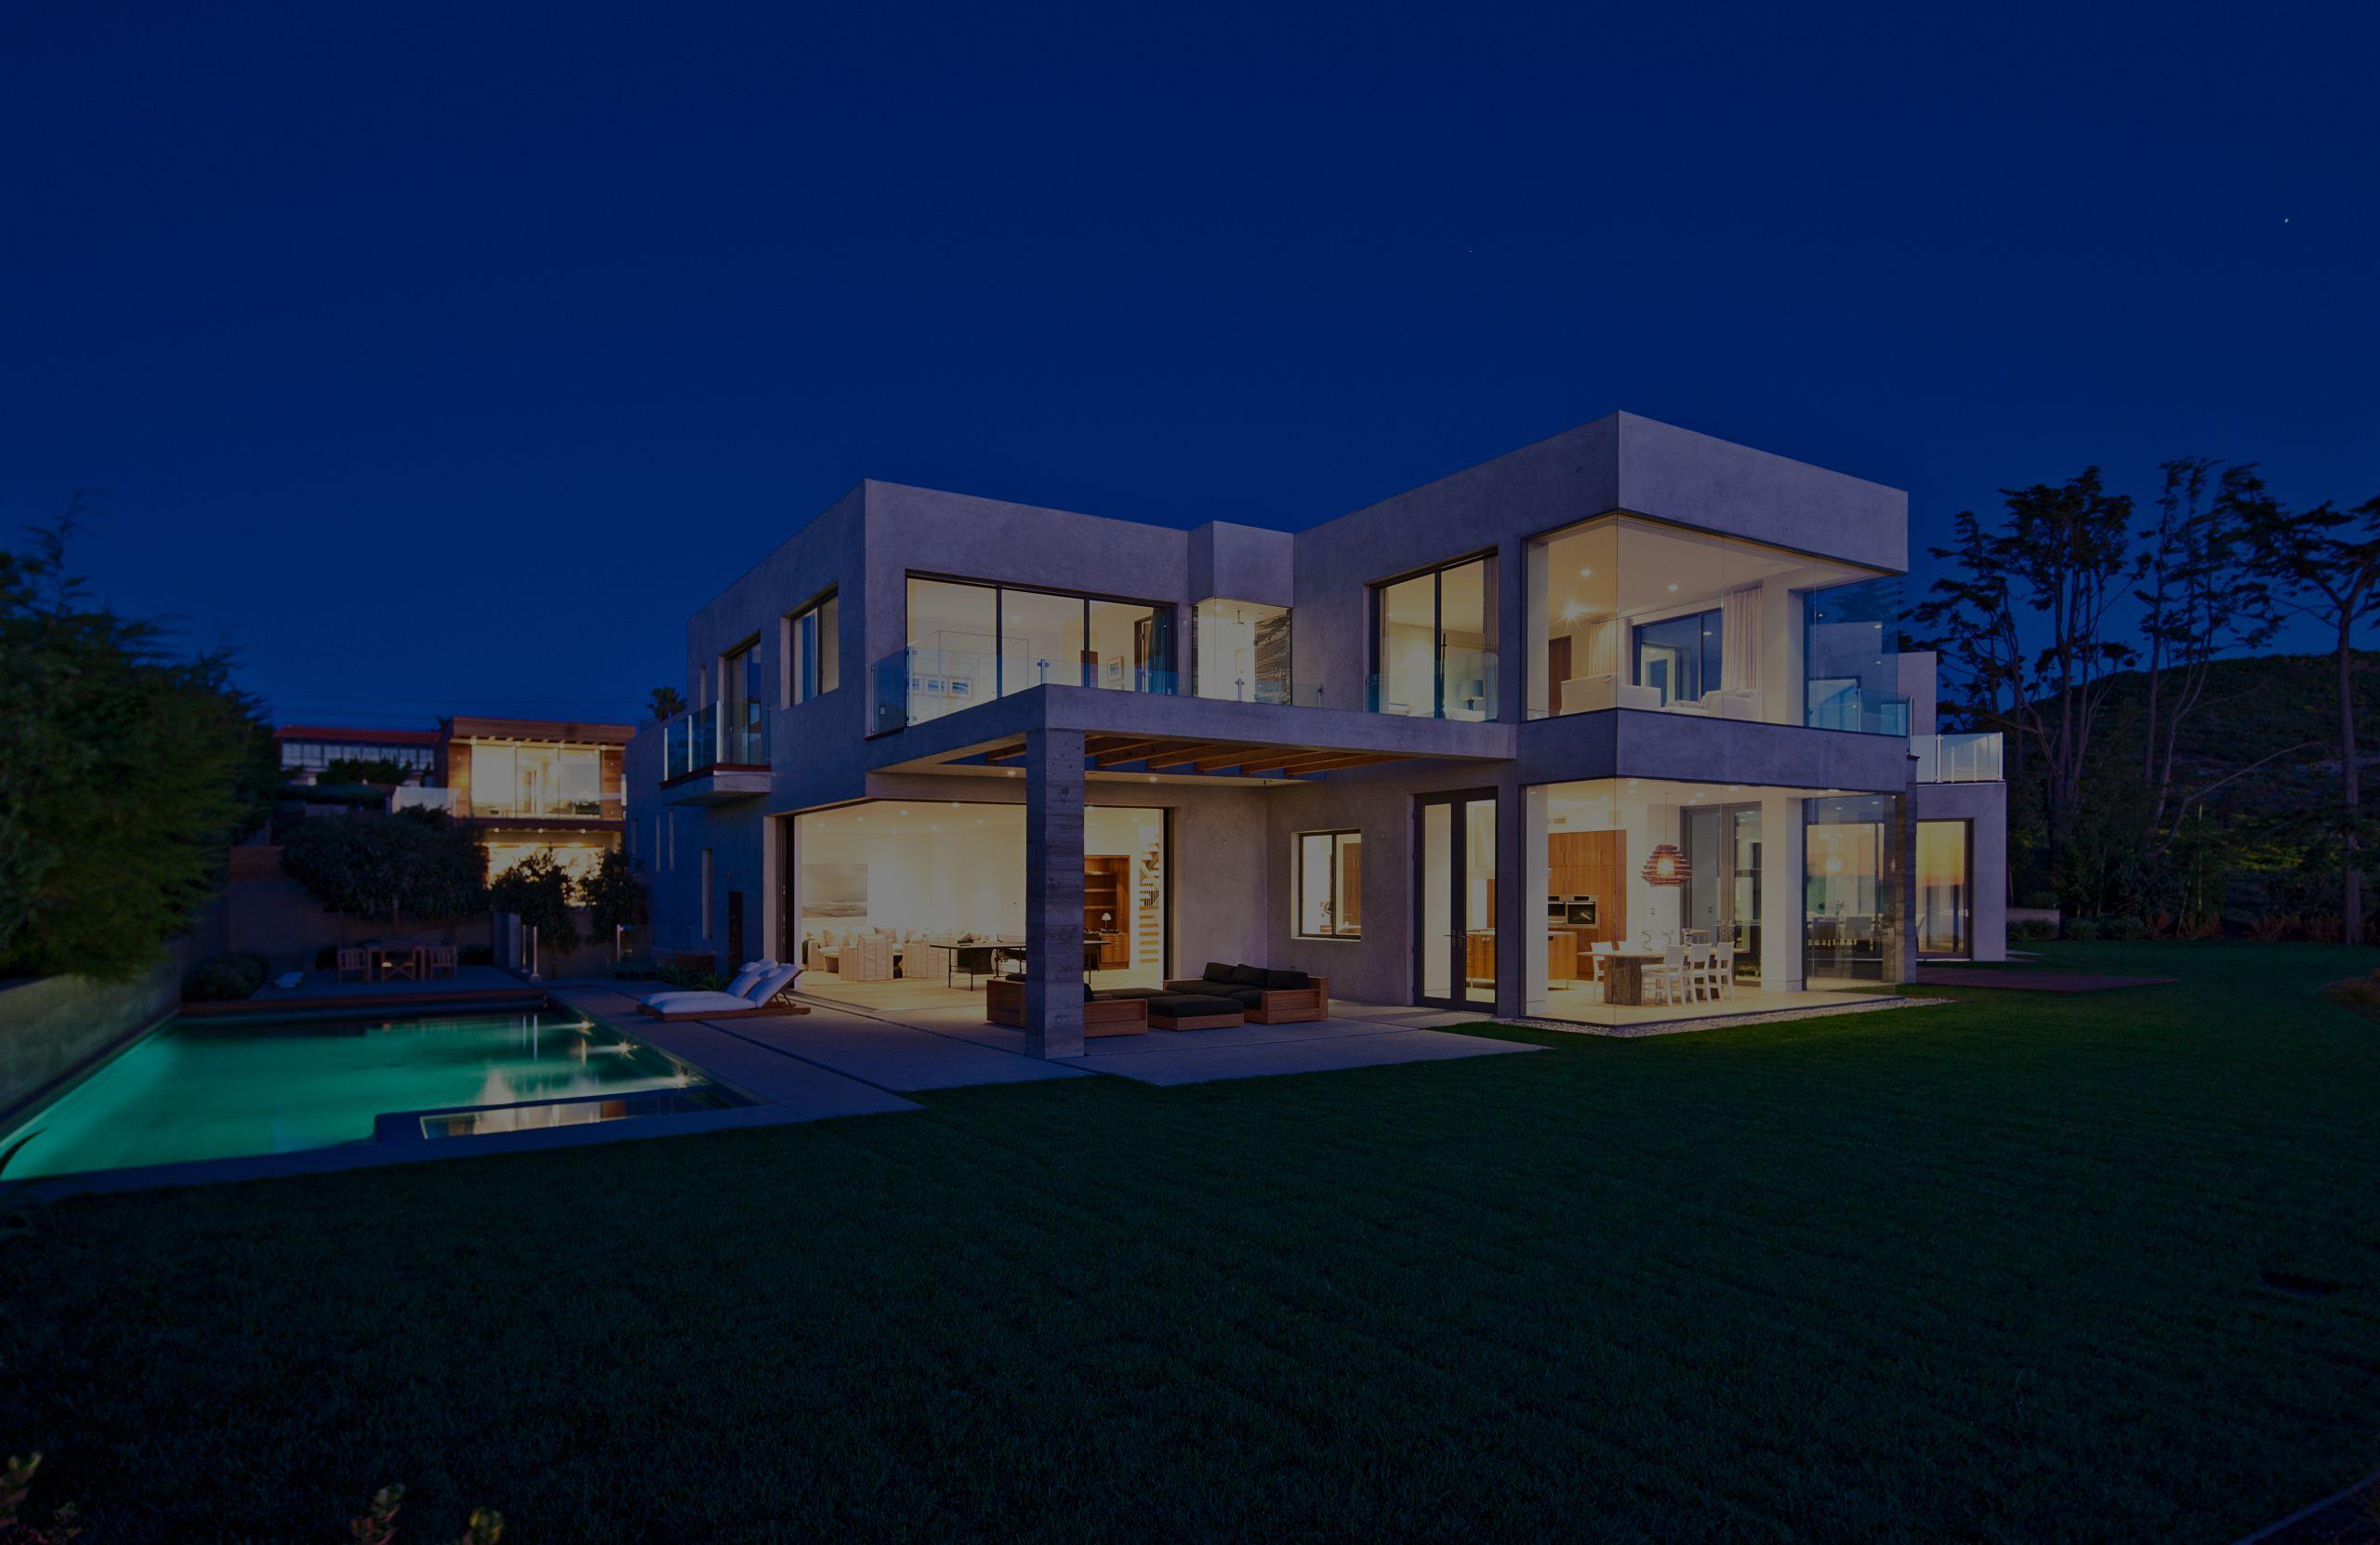 7377 Birdview Ave, Malibu. SOLD -  $ 21,000,000